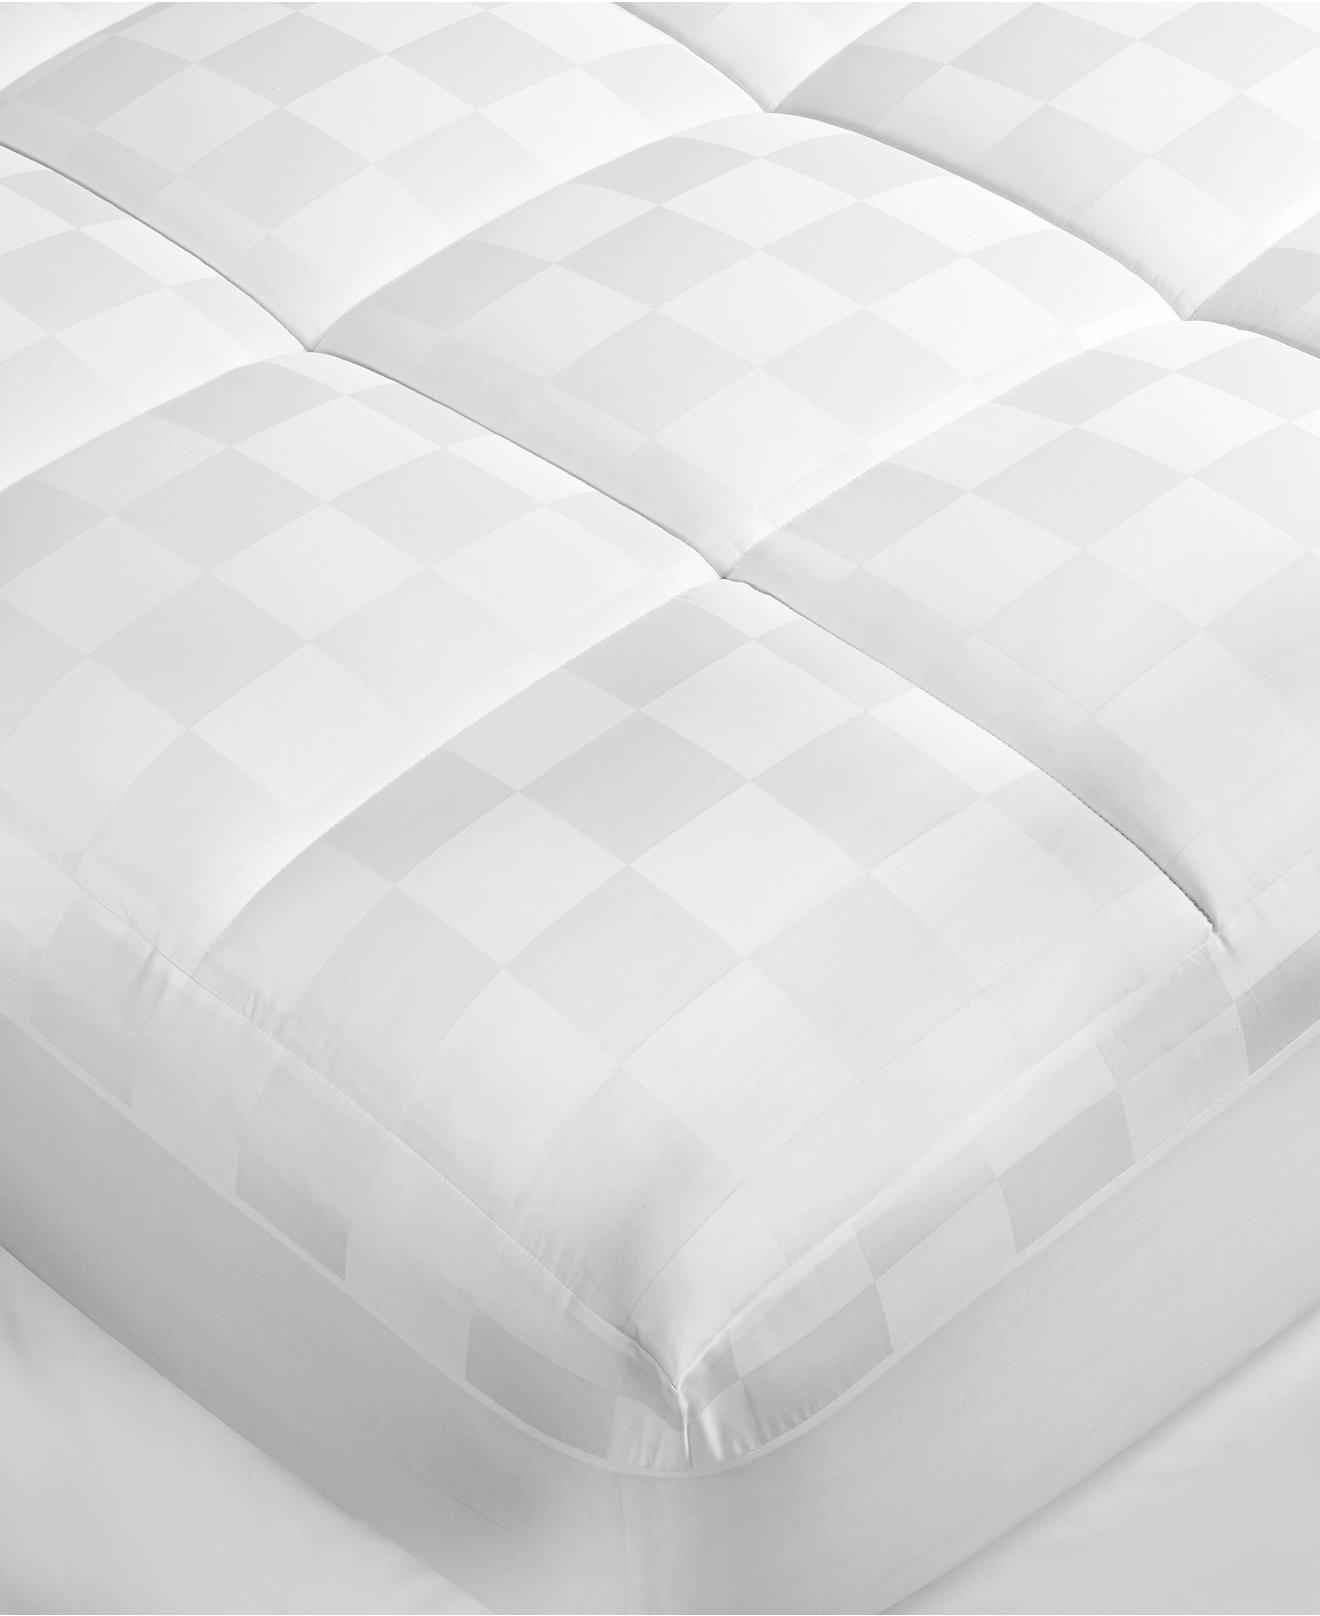 100 home design waterproof queen mattress pad sealy cozy rest 2 pack waterproof fitted - Home design mattress pads ...